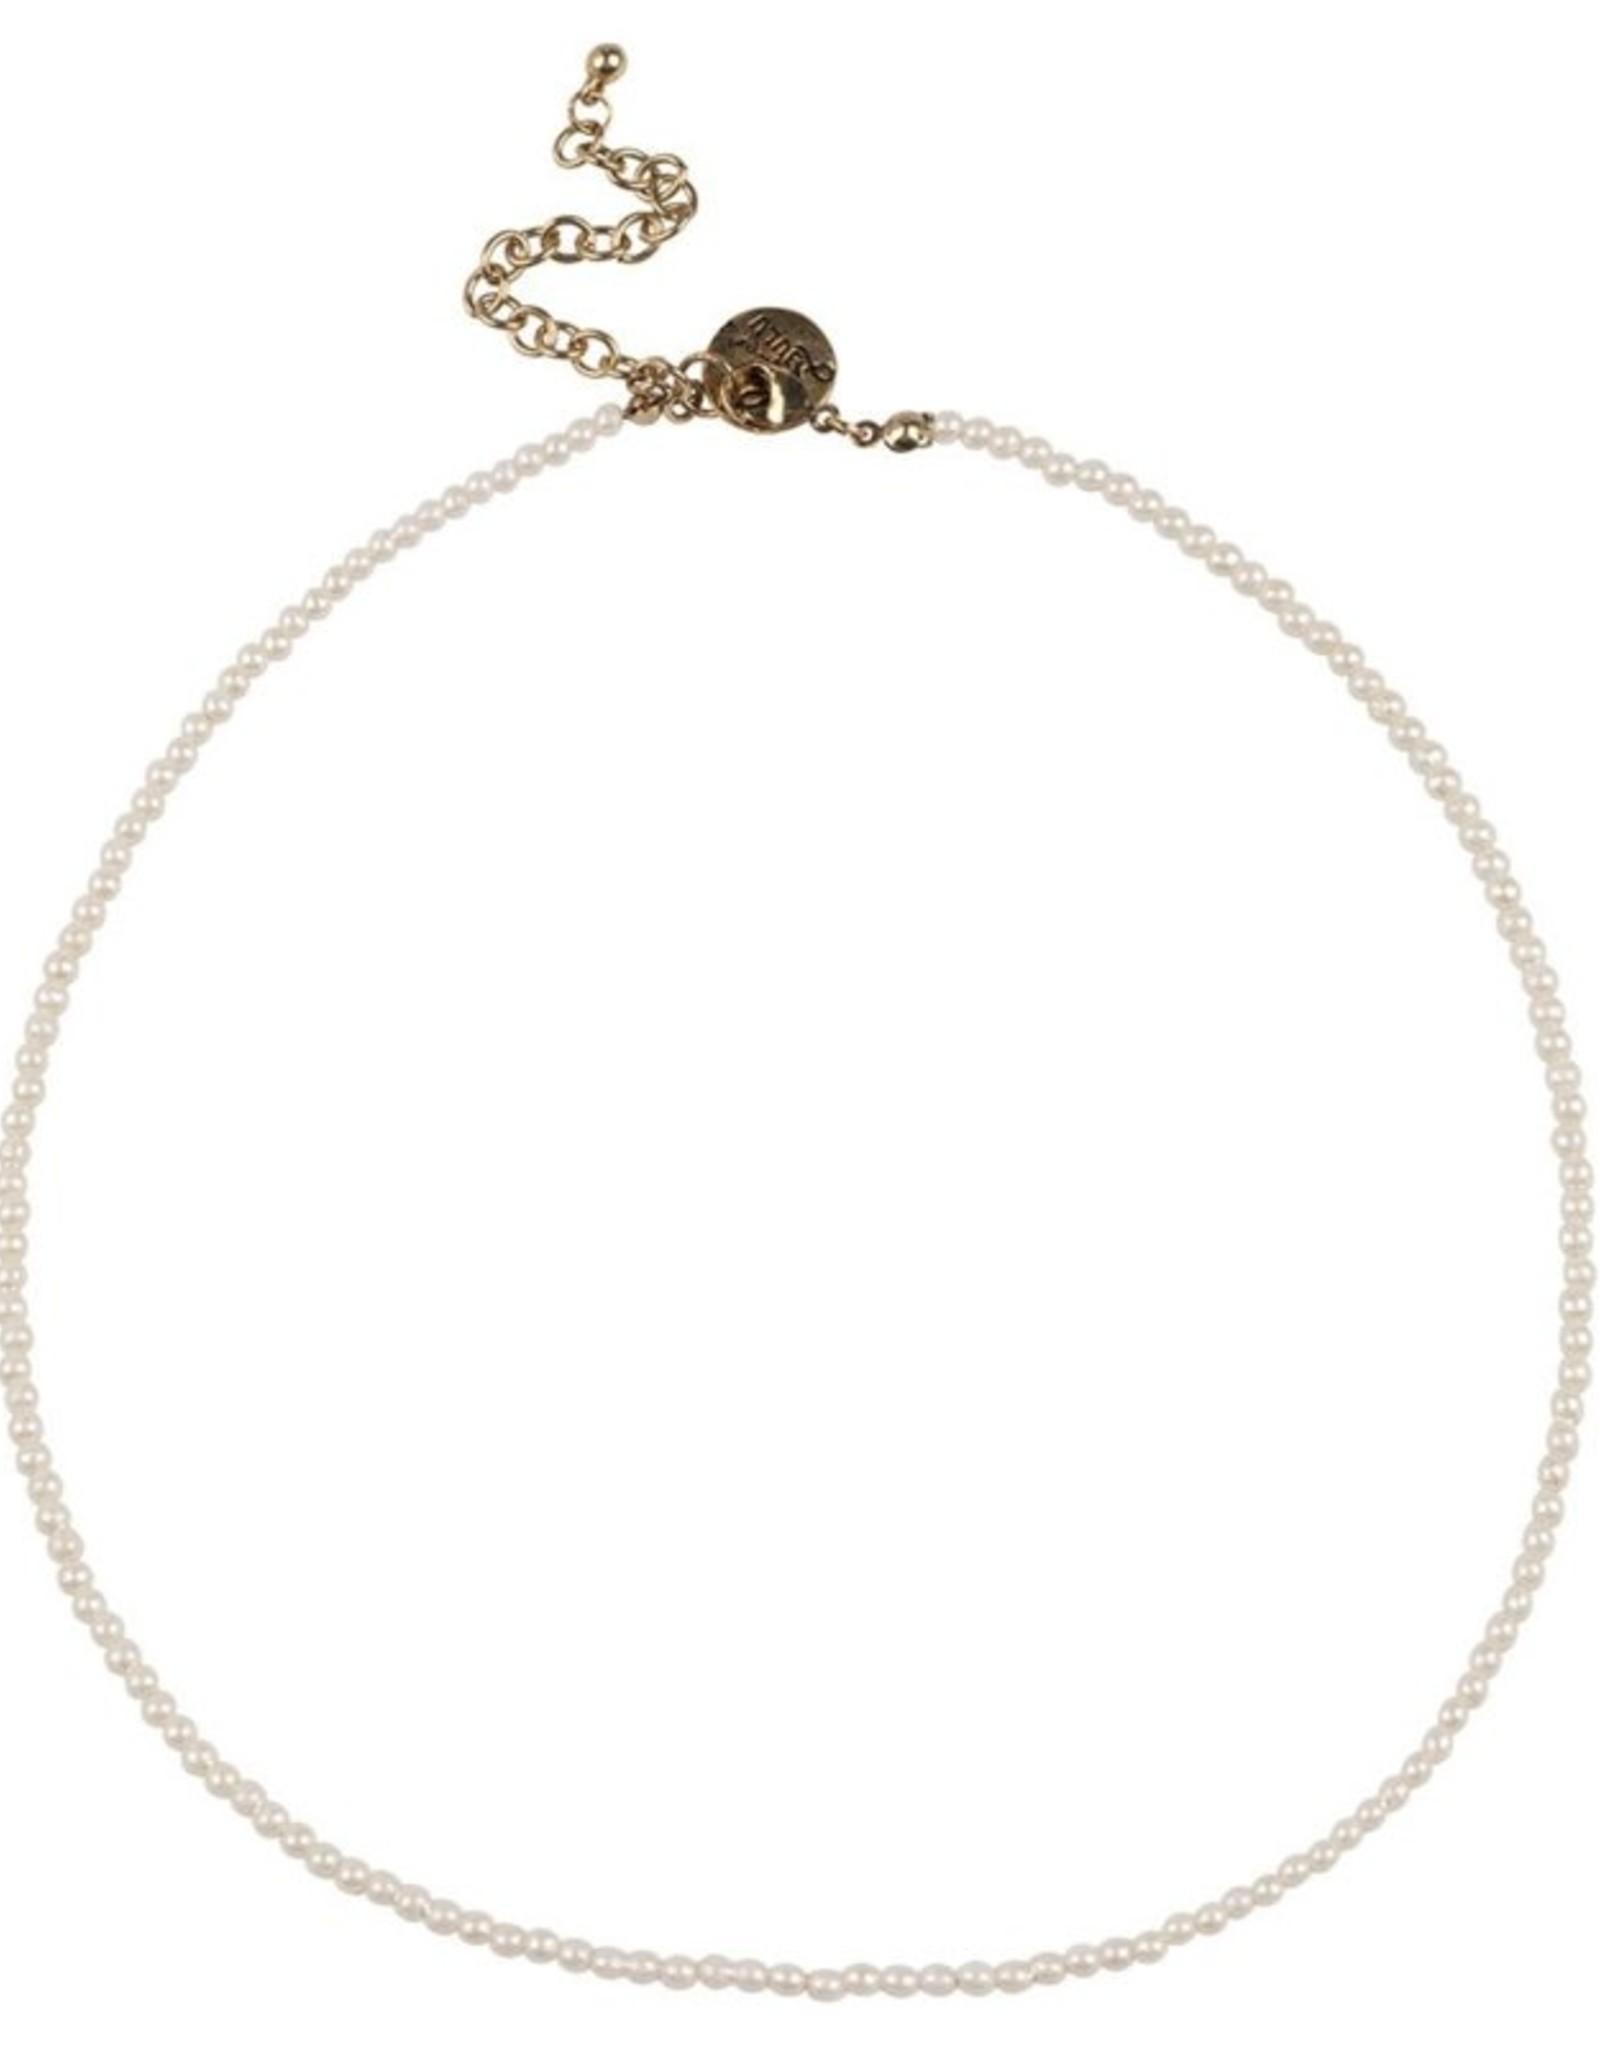 Bulu Bulu Happy Beads Necklace pearl